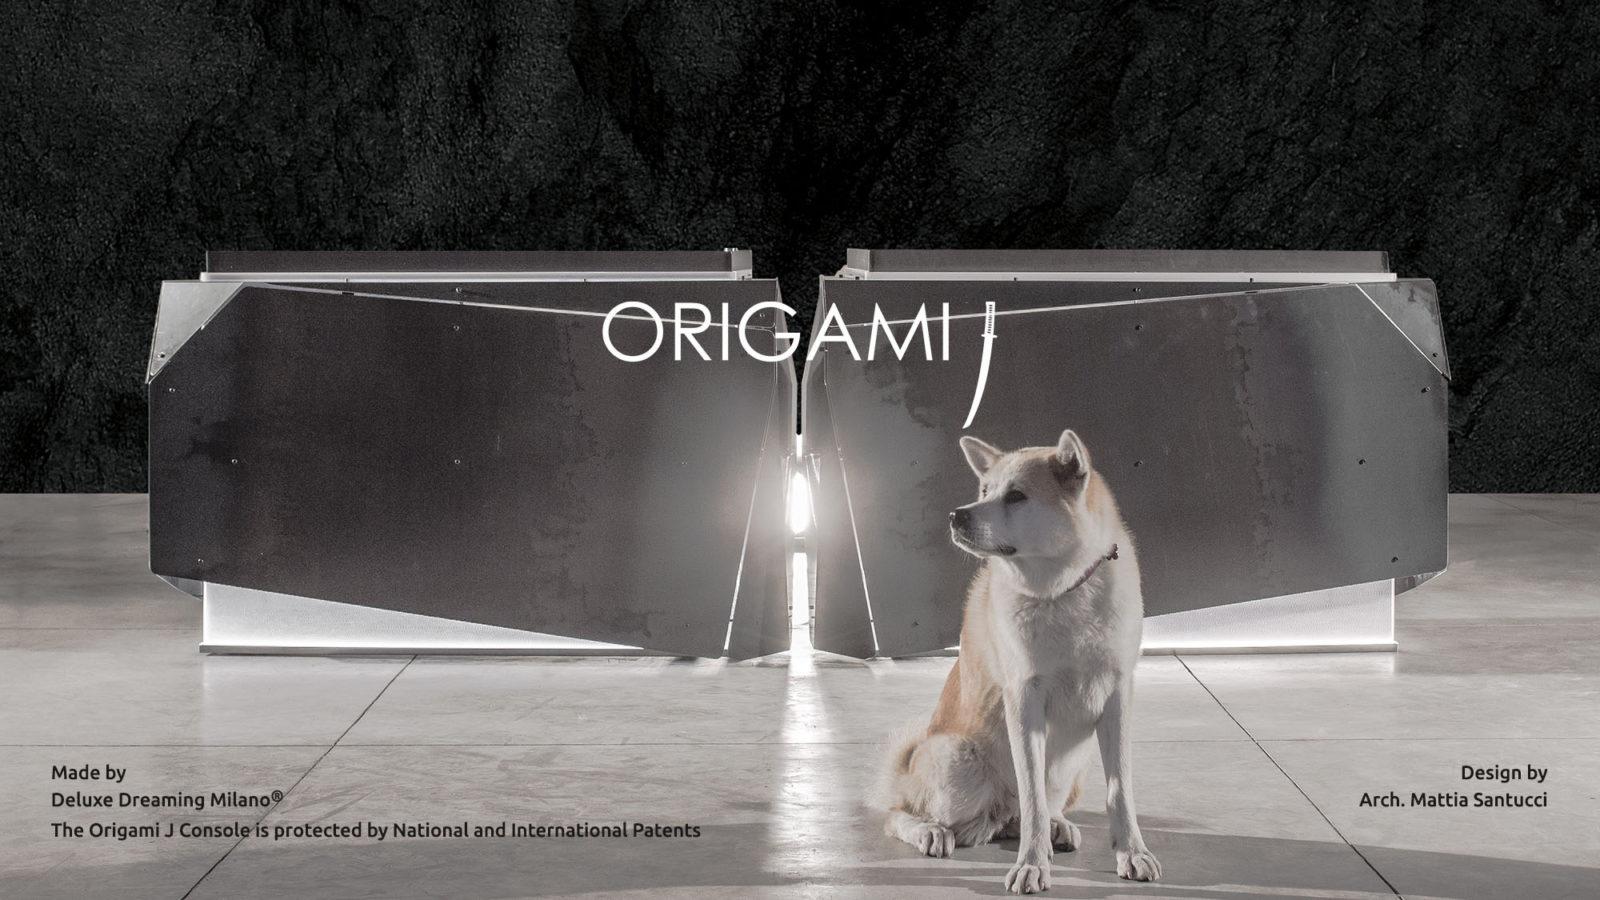 Origami J console Deluxe Dreaming Milano